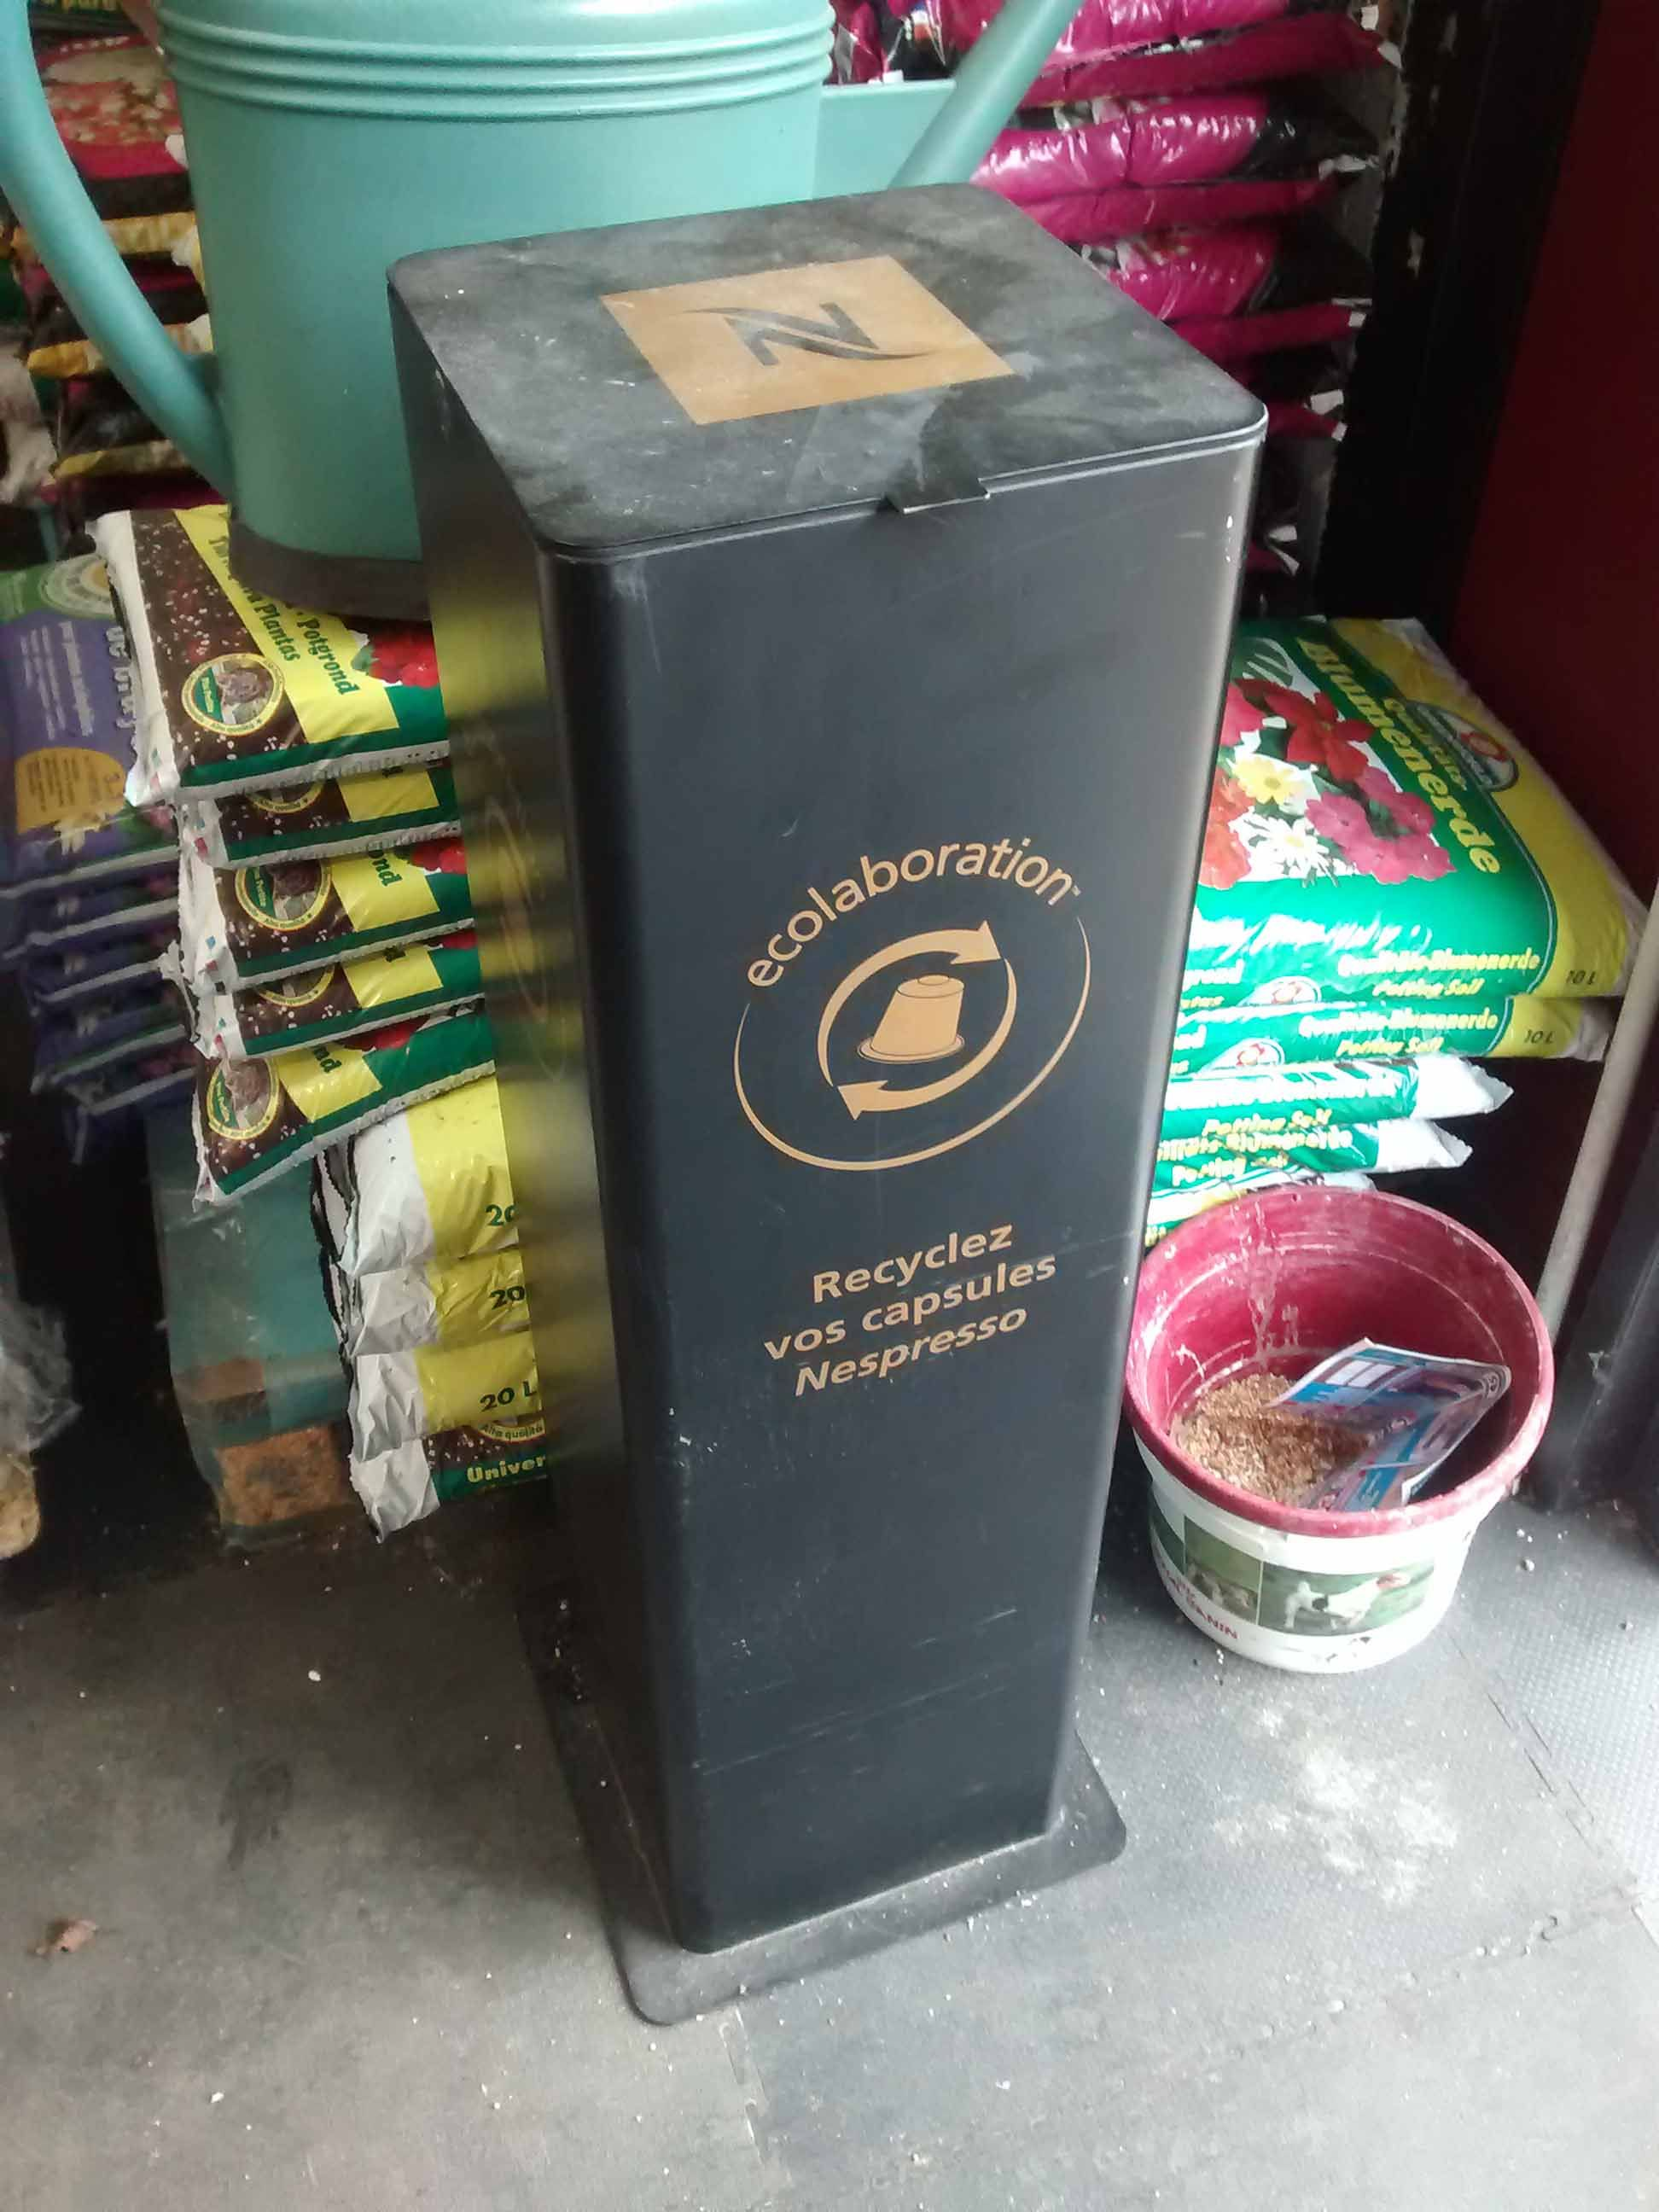 nespresso borne recyclage capsules point relais 2015 10 paris ecolo 39 g pinterest. Black Bedroom Furniture Sets. Home Design Ideas